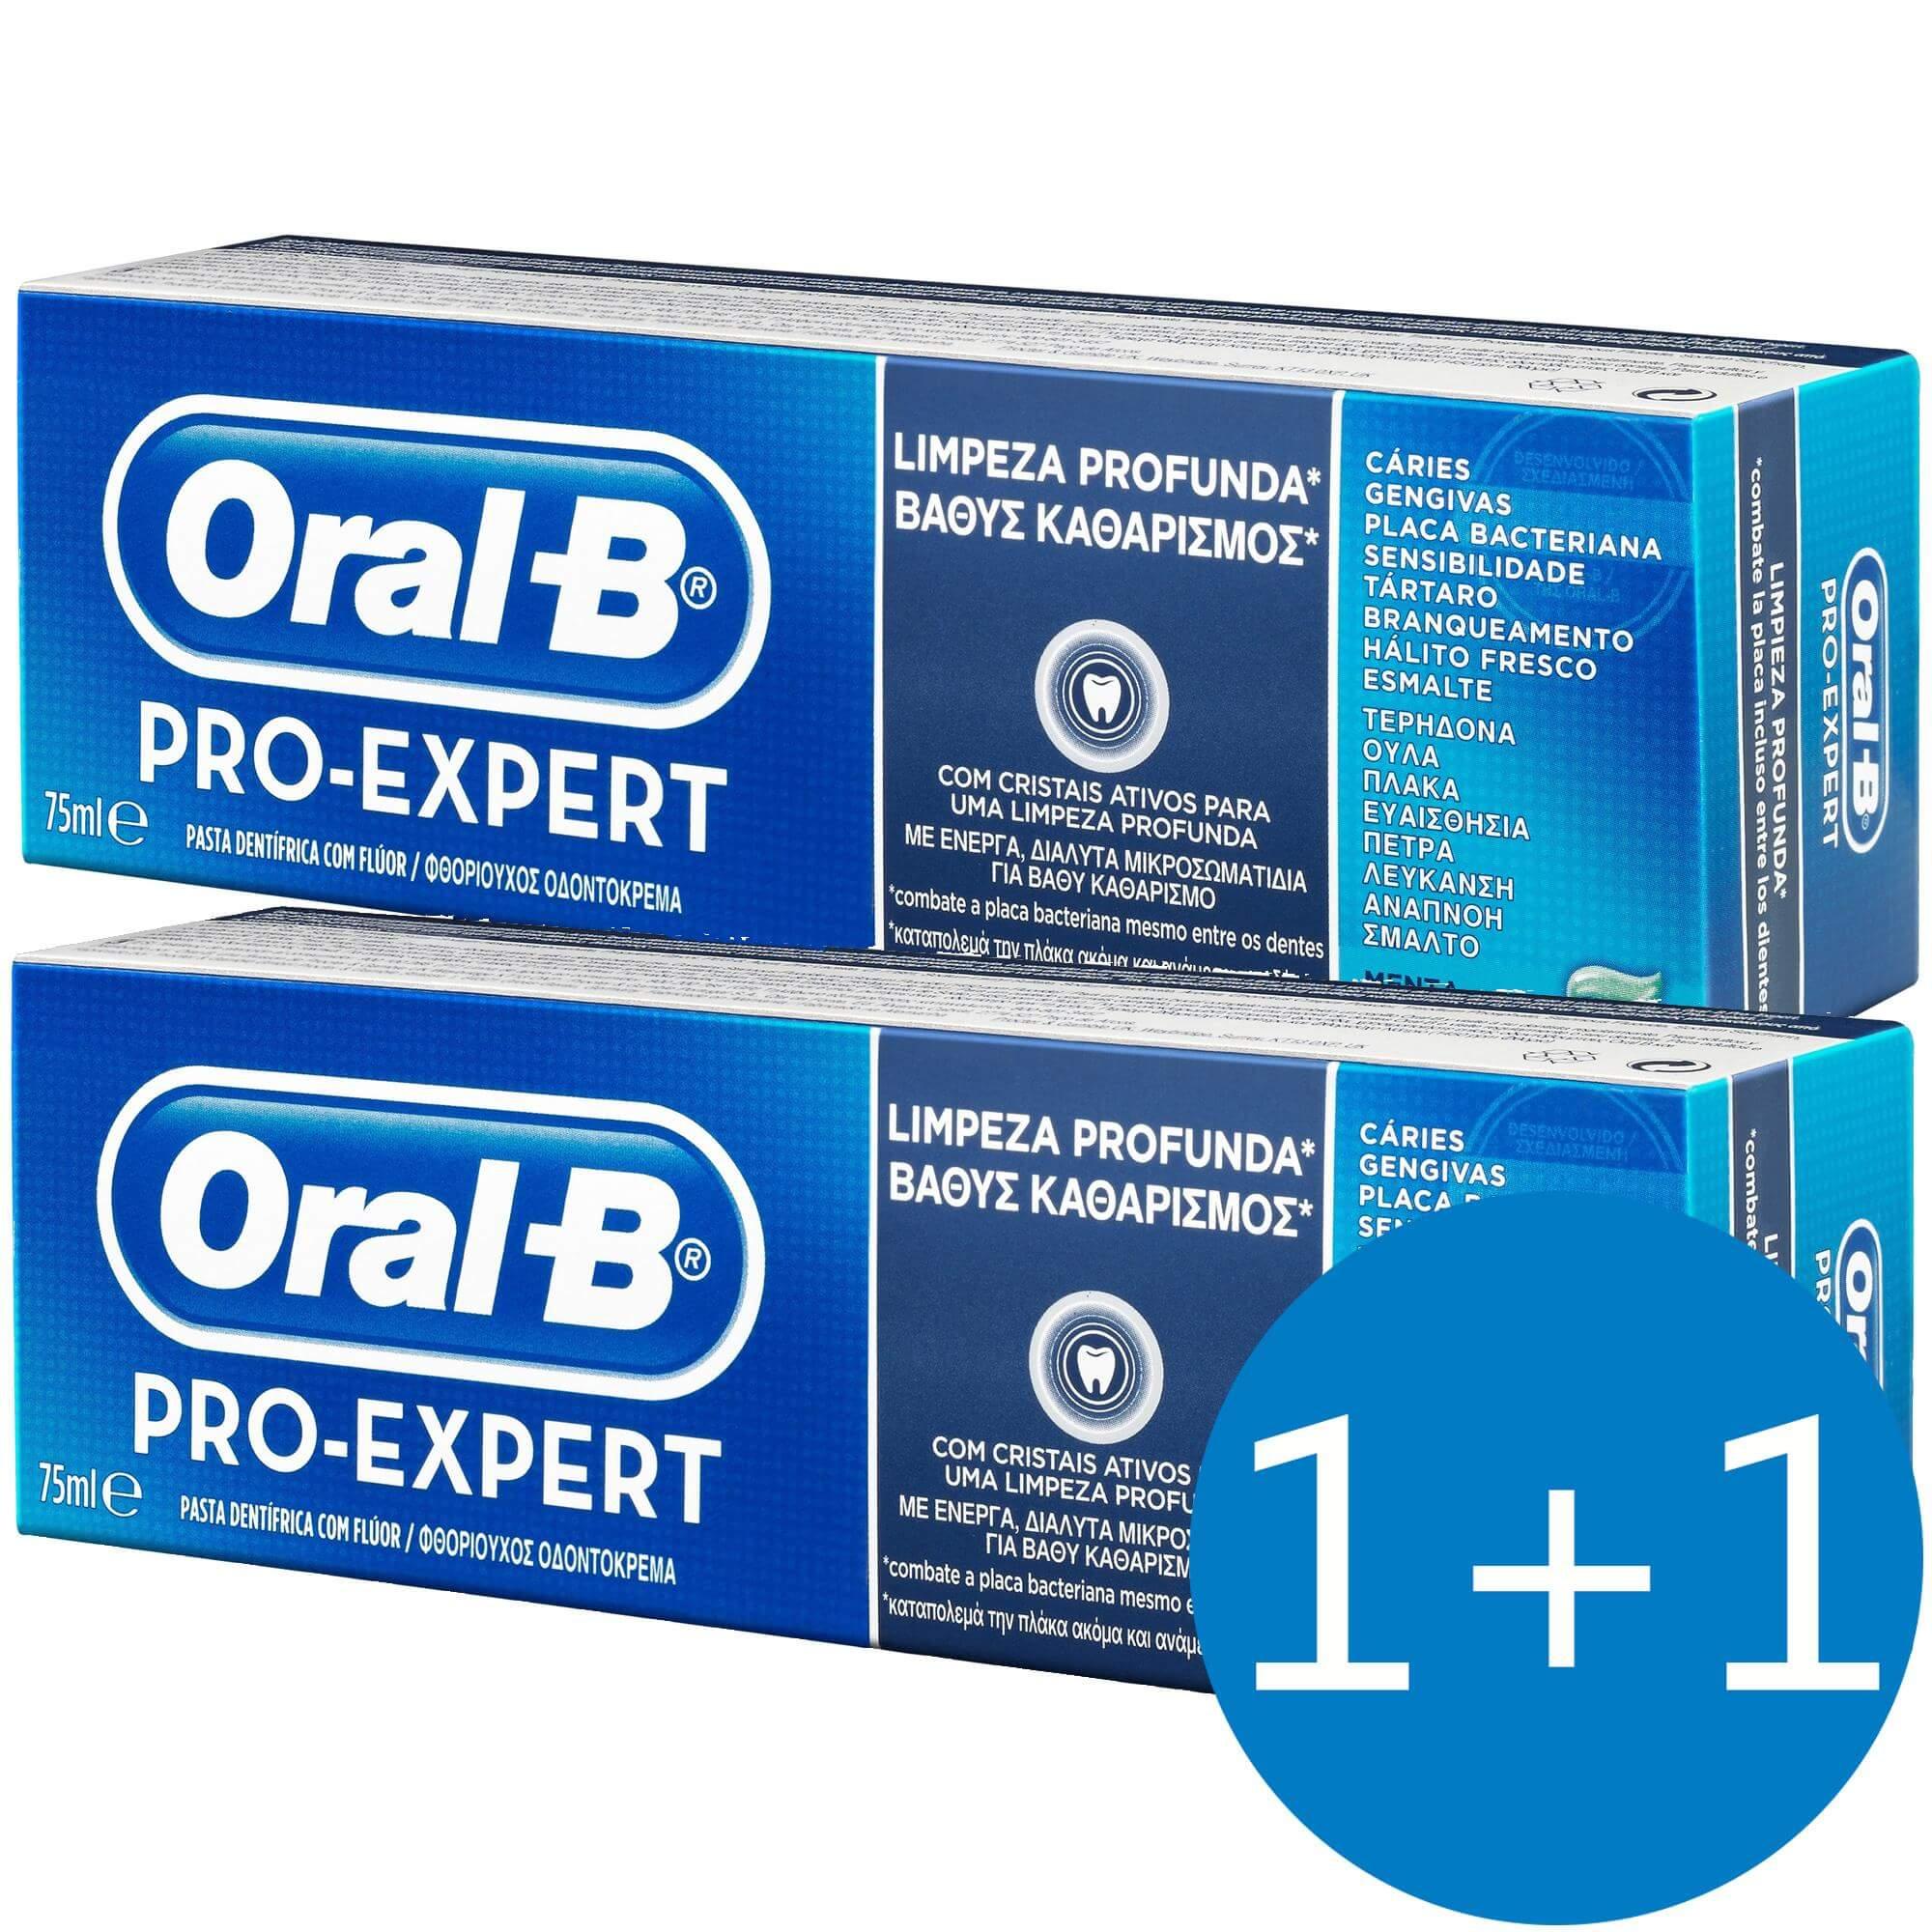 Oral-B Πακέτο Προσφοράς Pro-Expert Deep Clean Οδοντόκρεμα για Βαθύ Kαθαρισμό 75ml Προσφορά 1+1 Δώρο